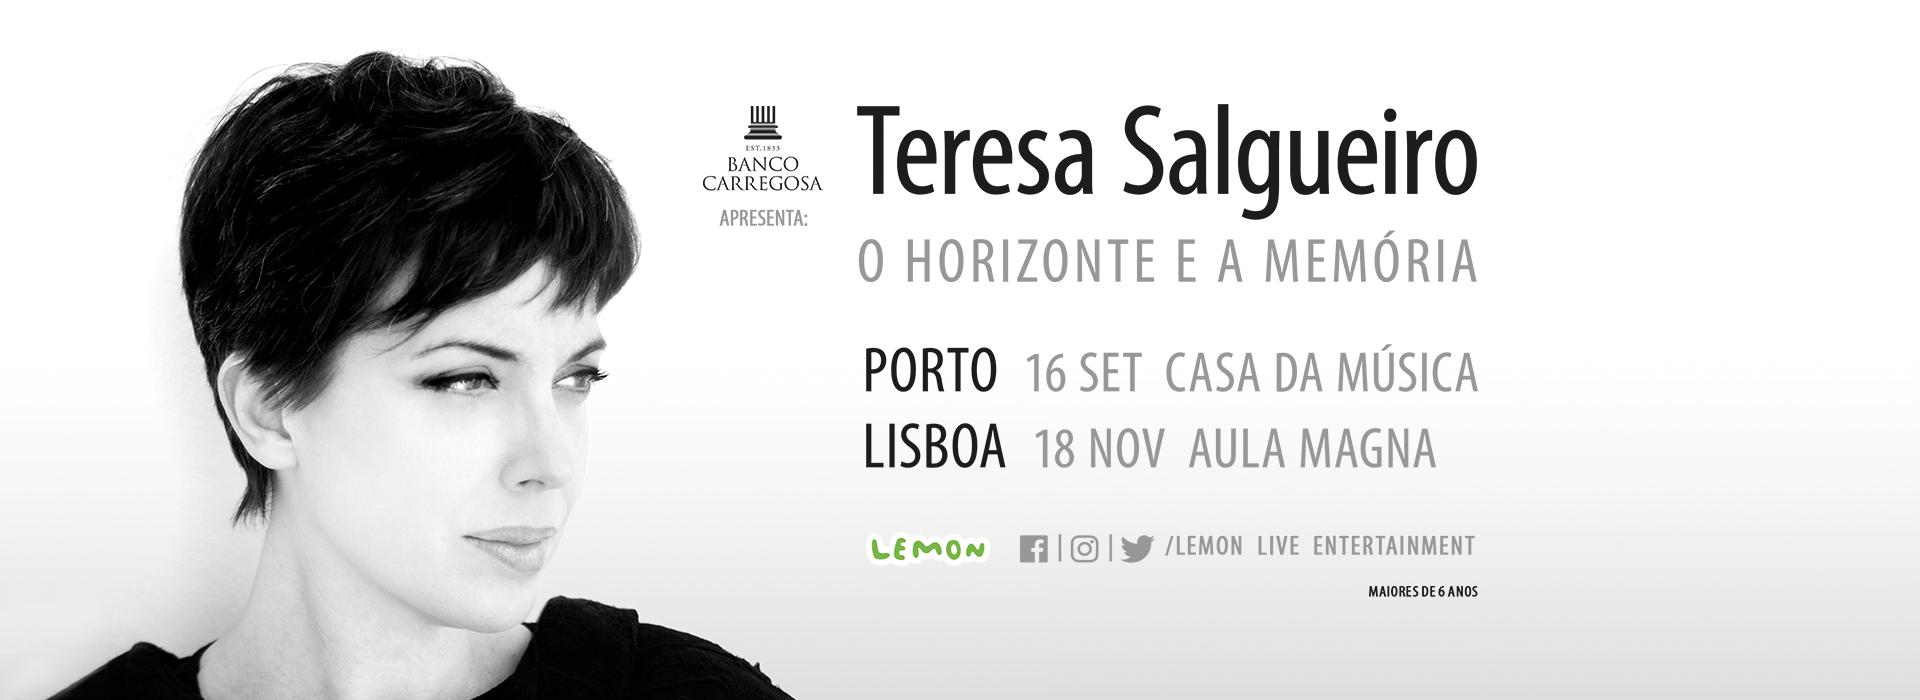 teresa_salgueiro_site_banner_1920x700px (1)